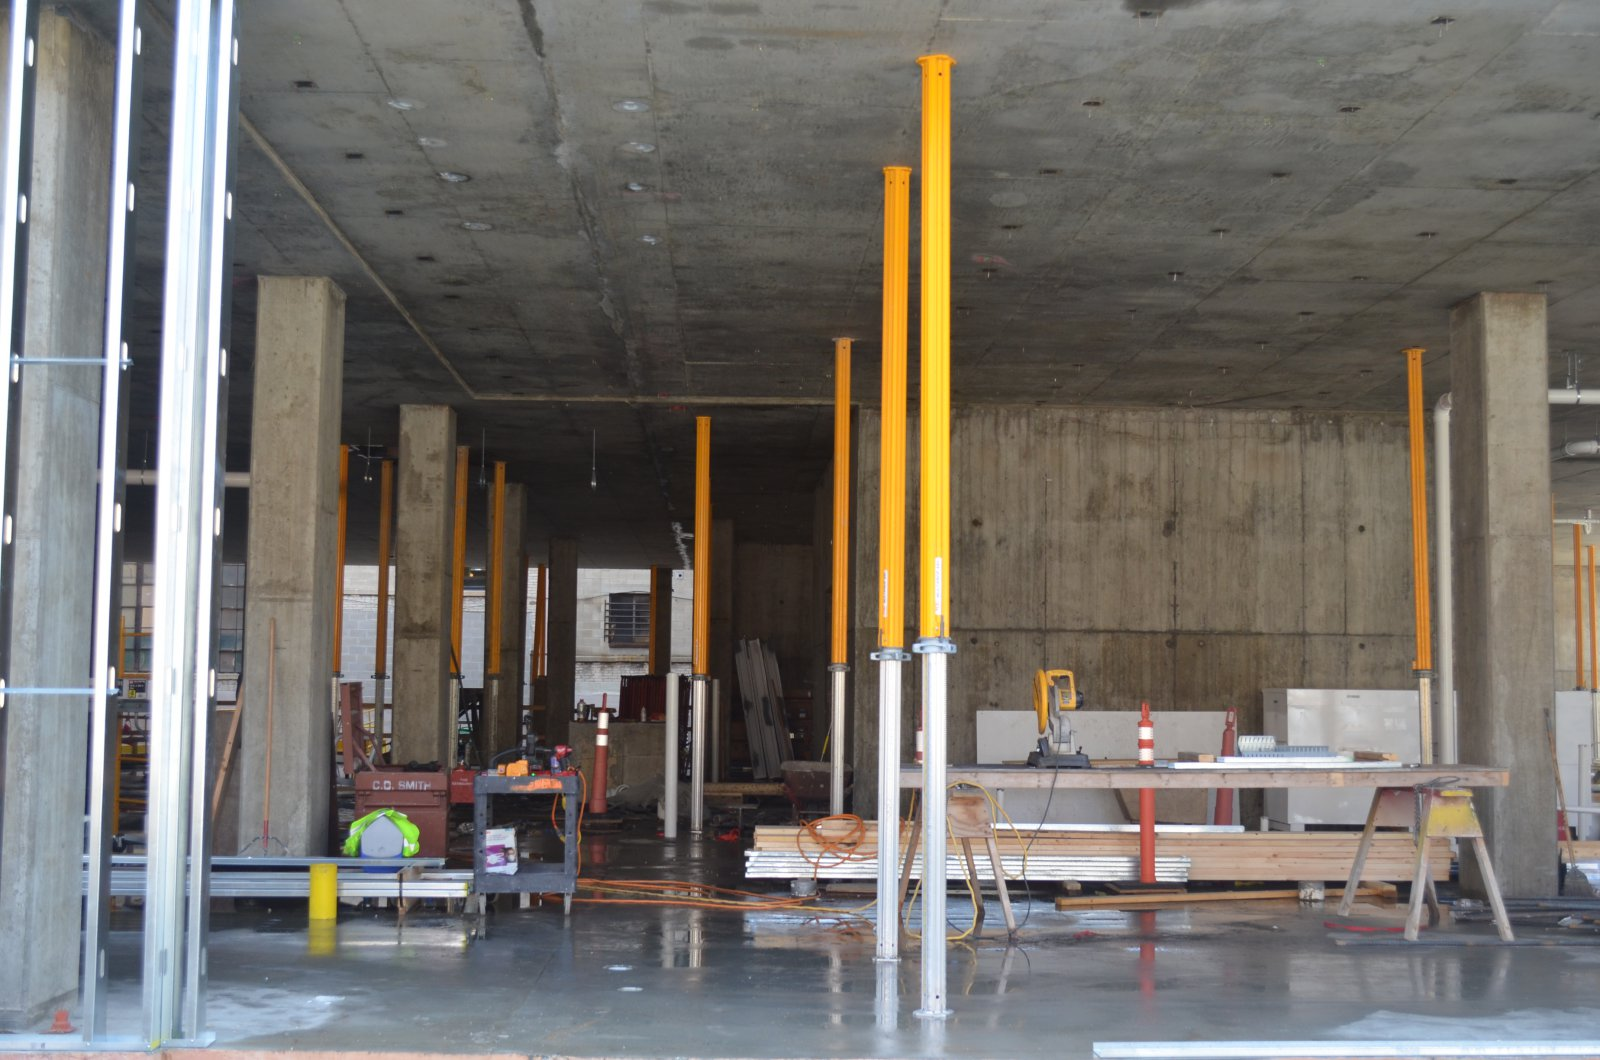 Kimpton Hotel Construction